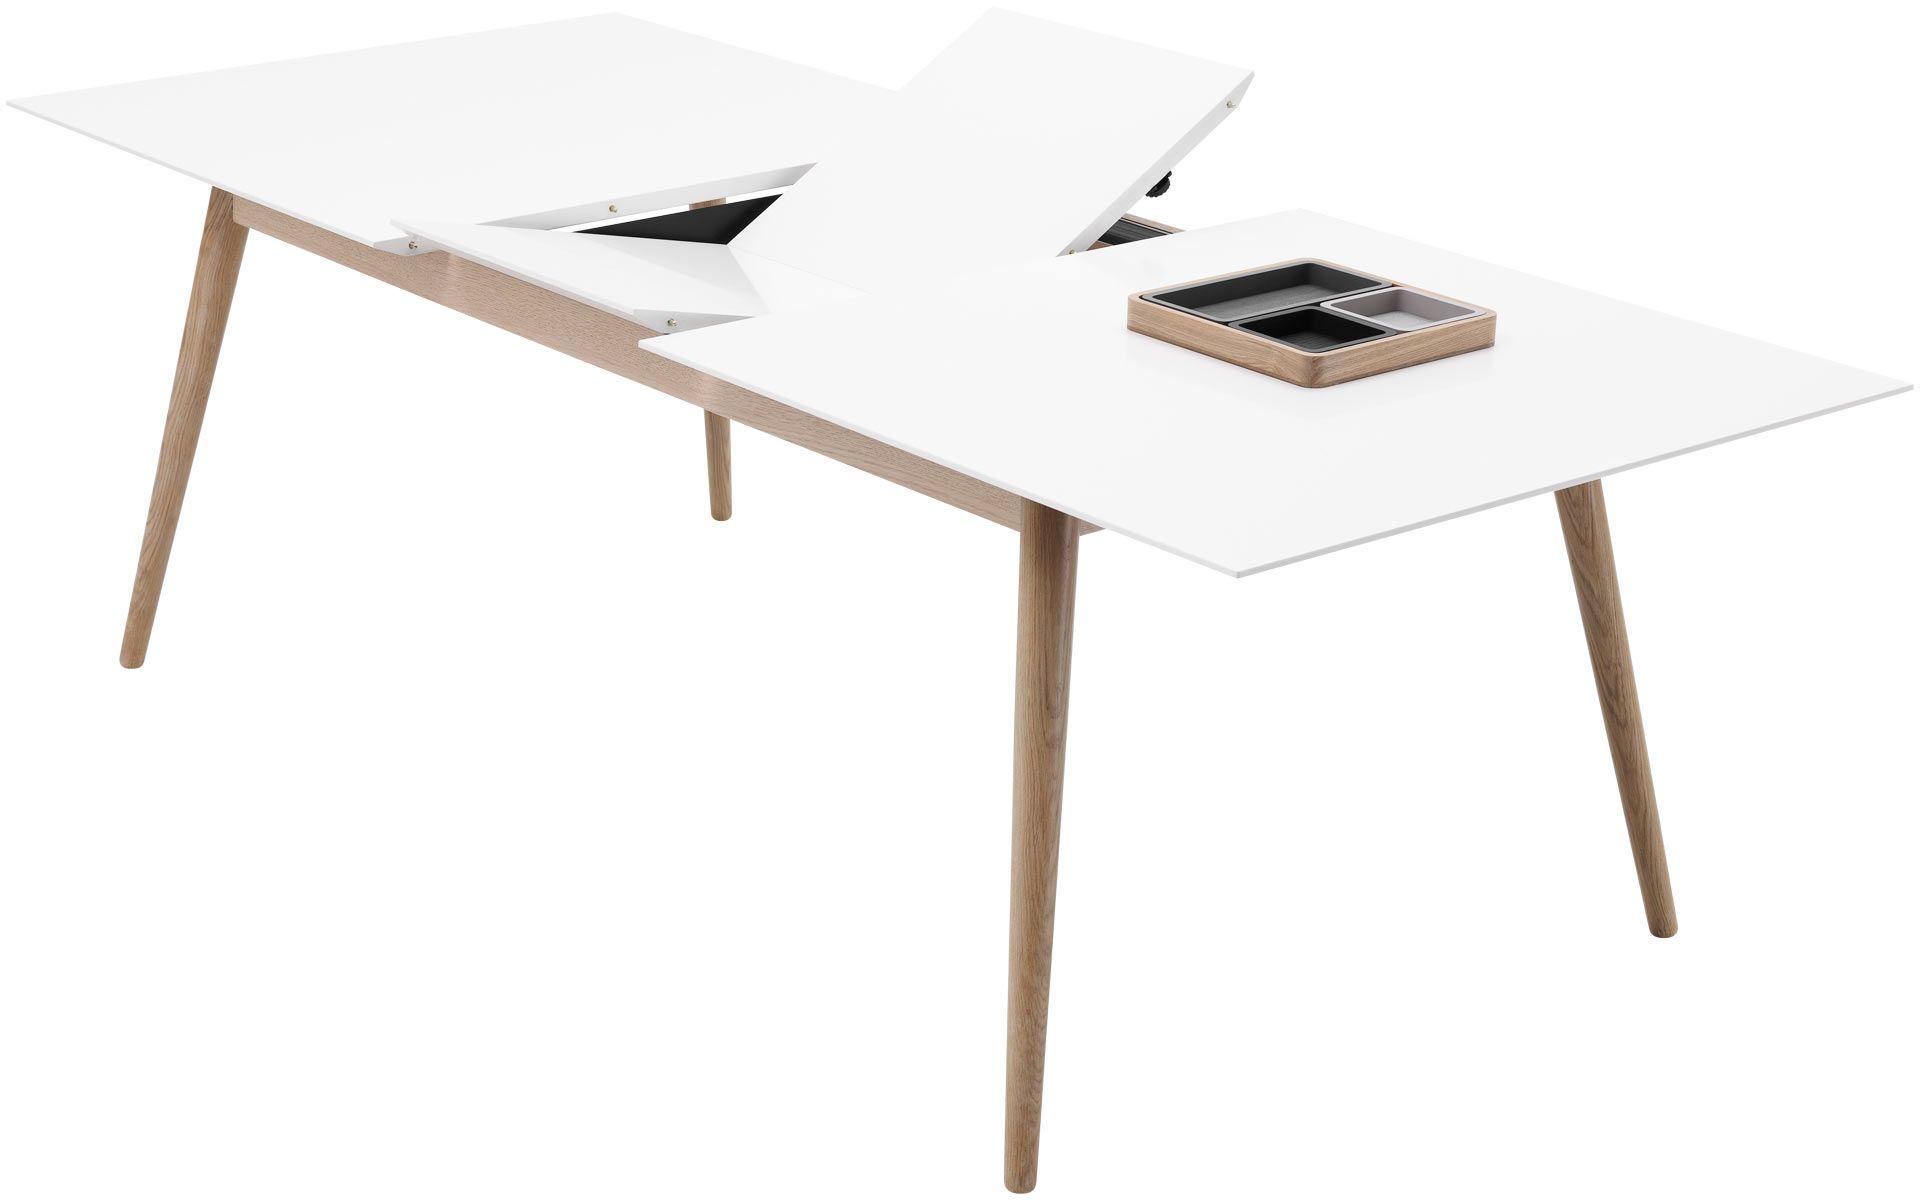 Simple, functional Scandinavian design | Dining | Pinterest ...